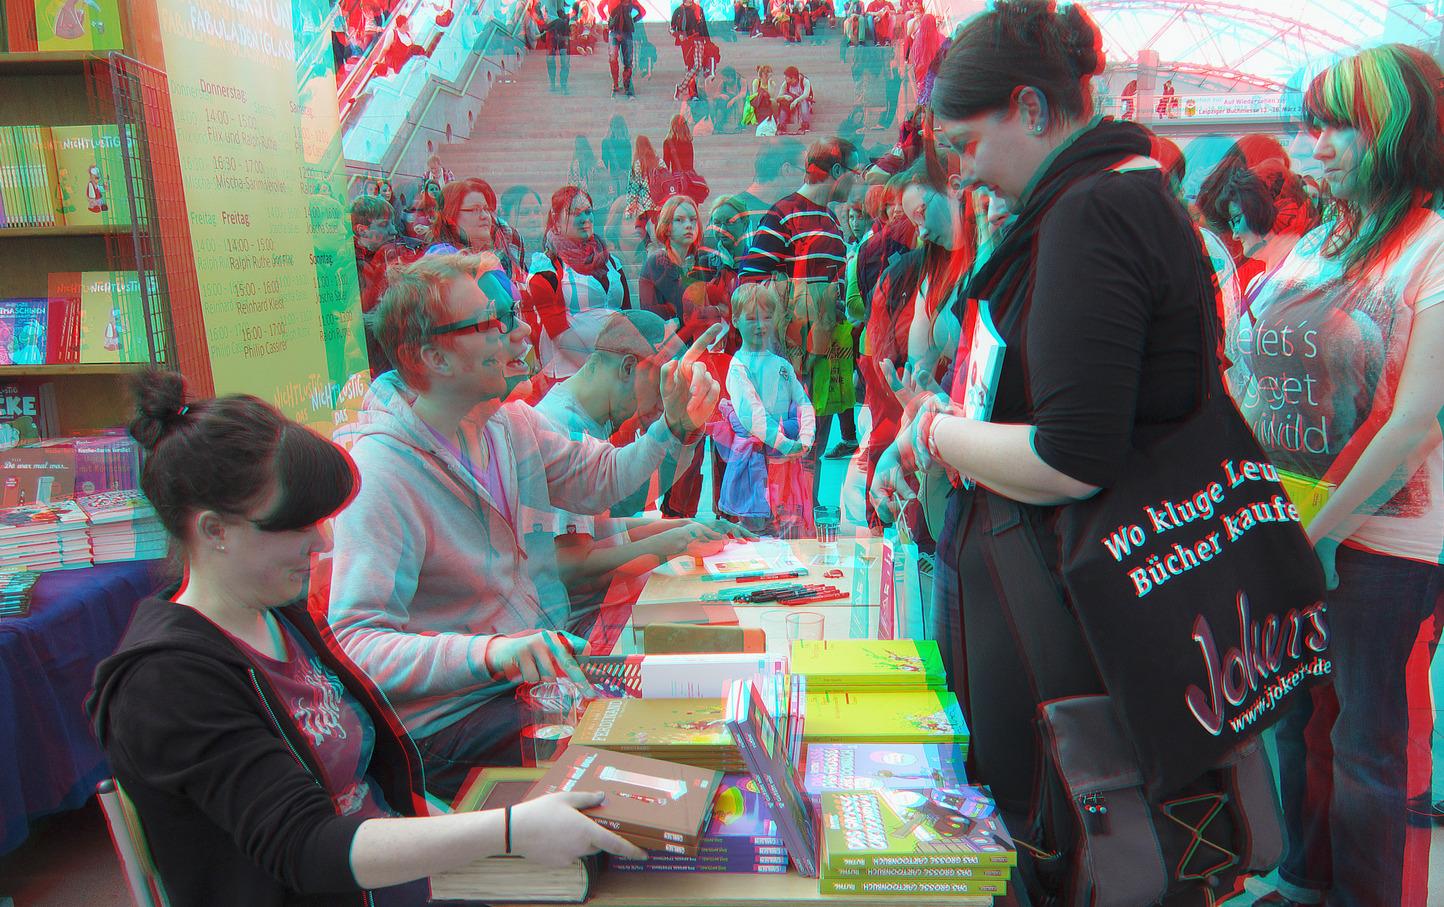 Buchmesse Leipzig 2013 (3D-Foto Nr. 03)